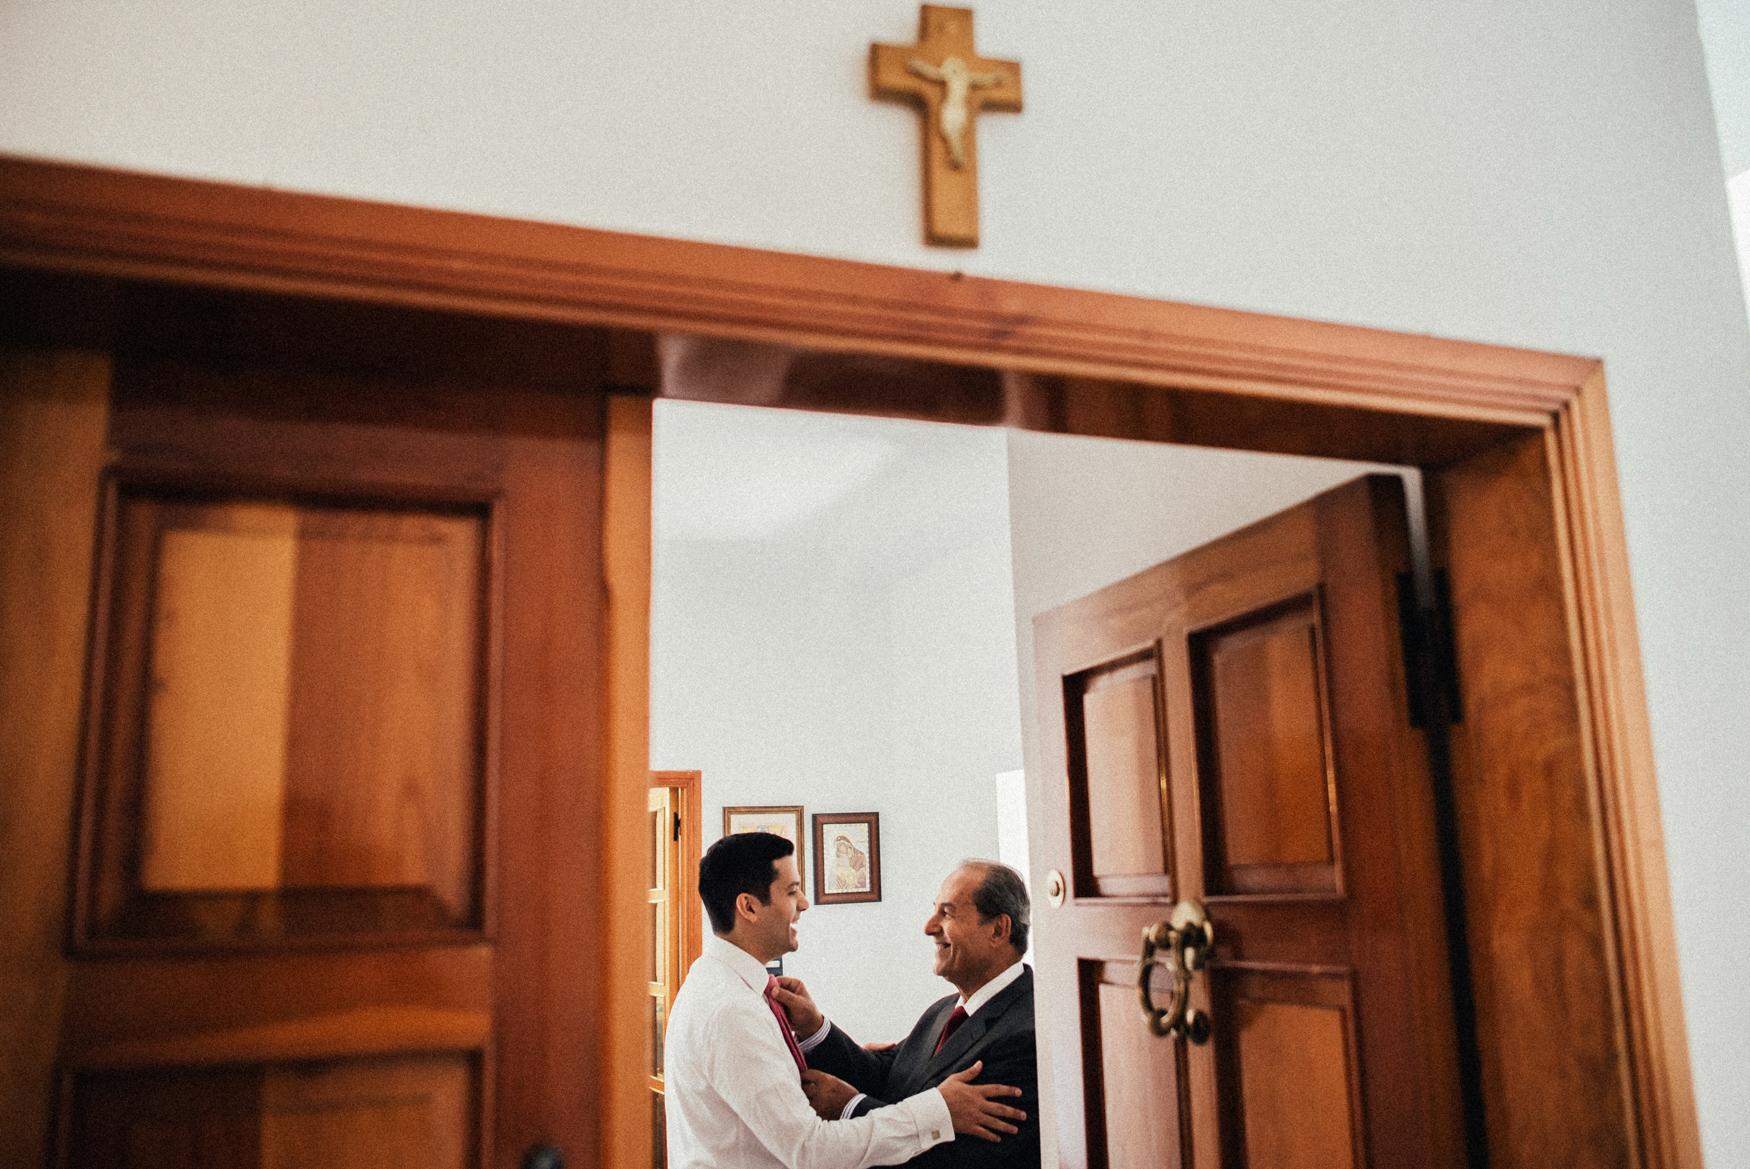 LR2 beirut byblos wedding photographer lebanon 007.jpg